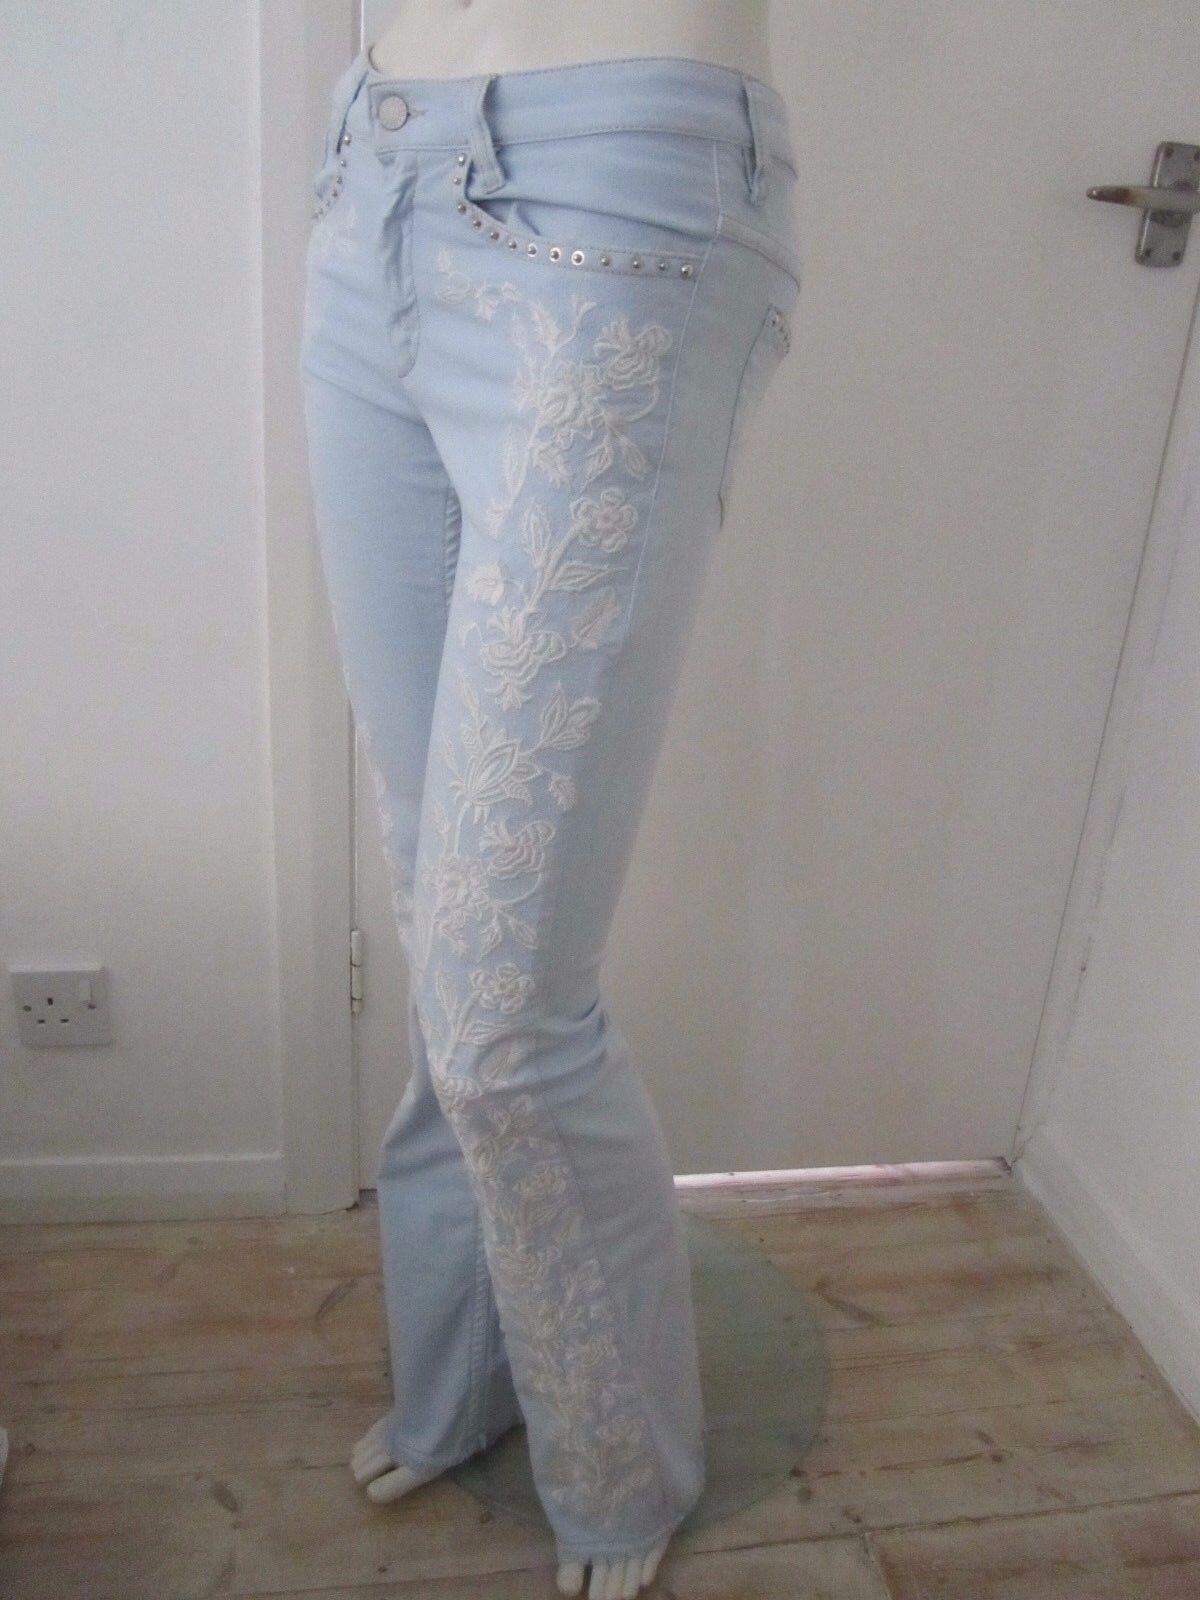 NUOVO Isabel Marant Stud Stud Stud impreziosito e logo ricamato Jeans avviocut 3aa412